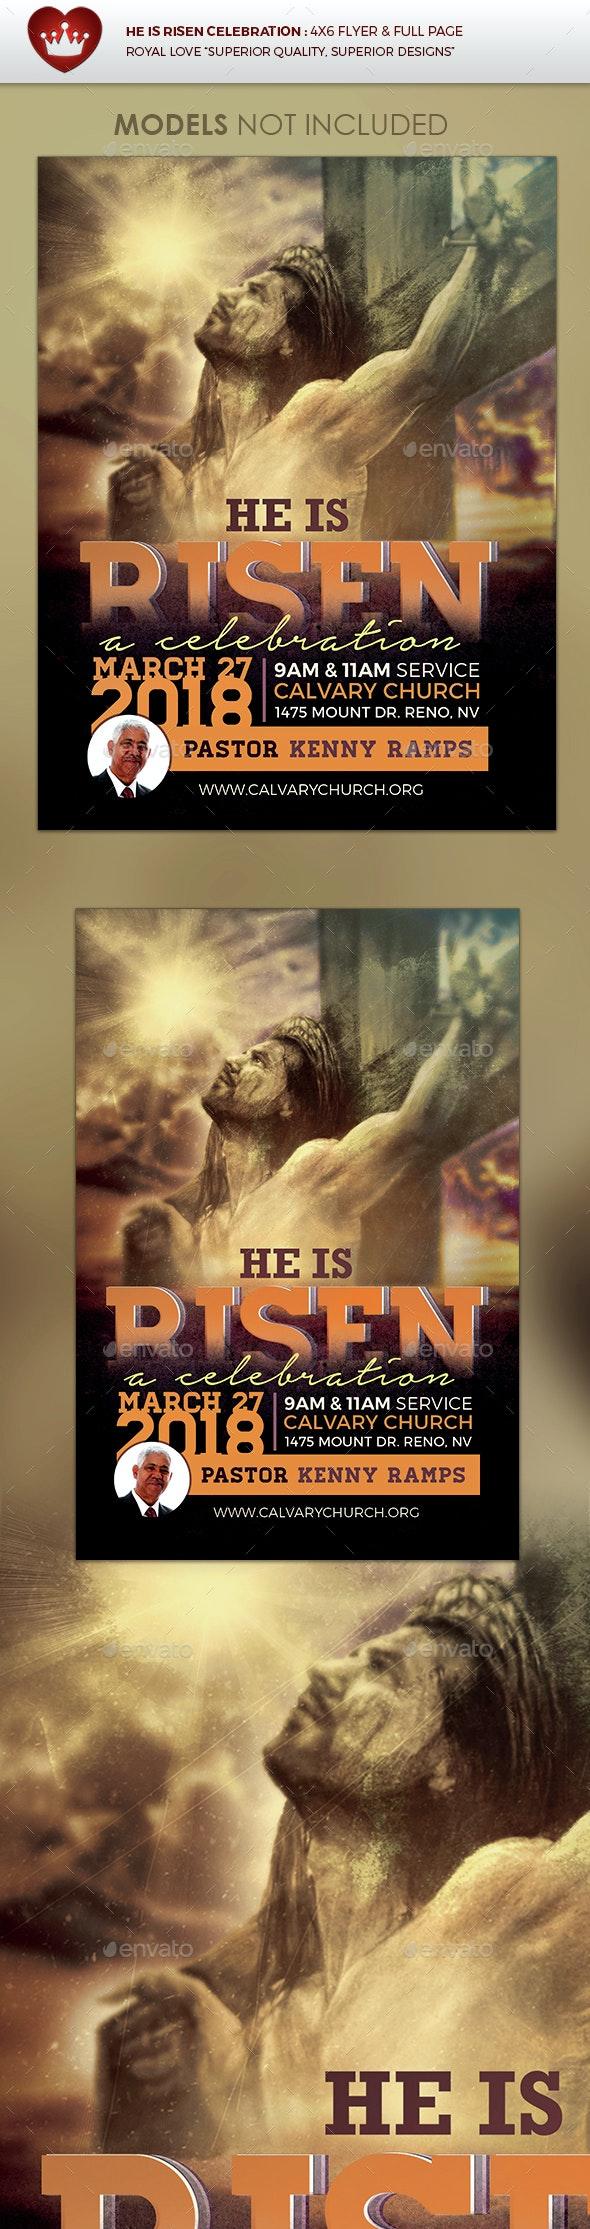 He is Risen Celebration Church Flyer - Church Flyers